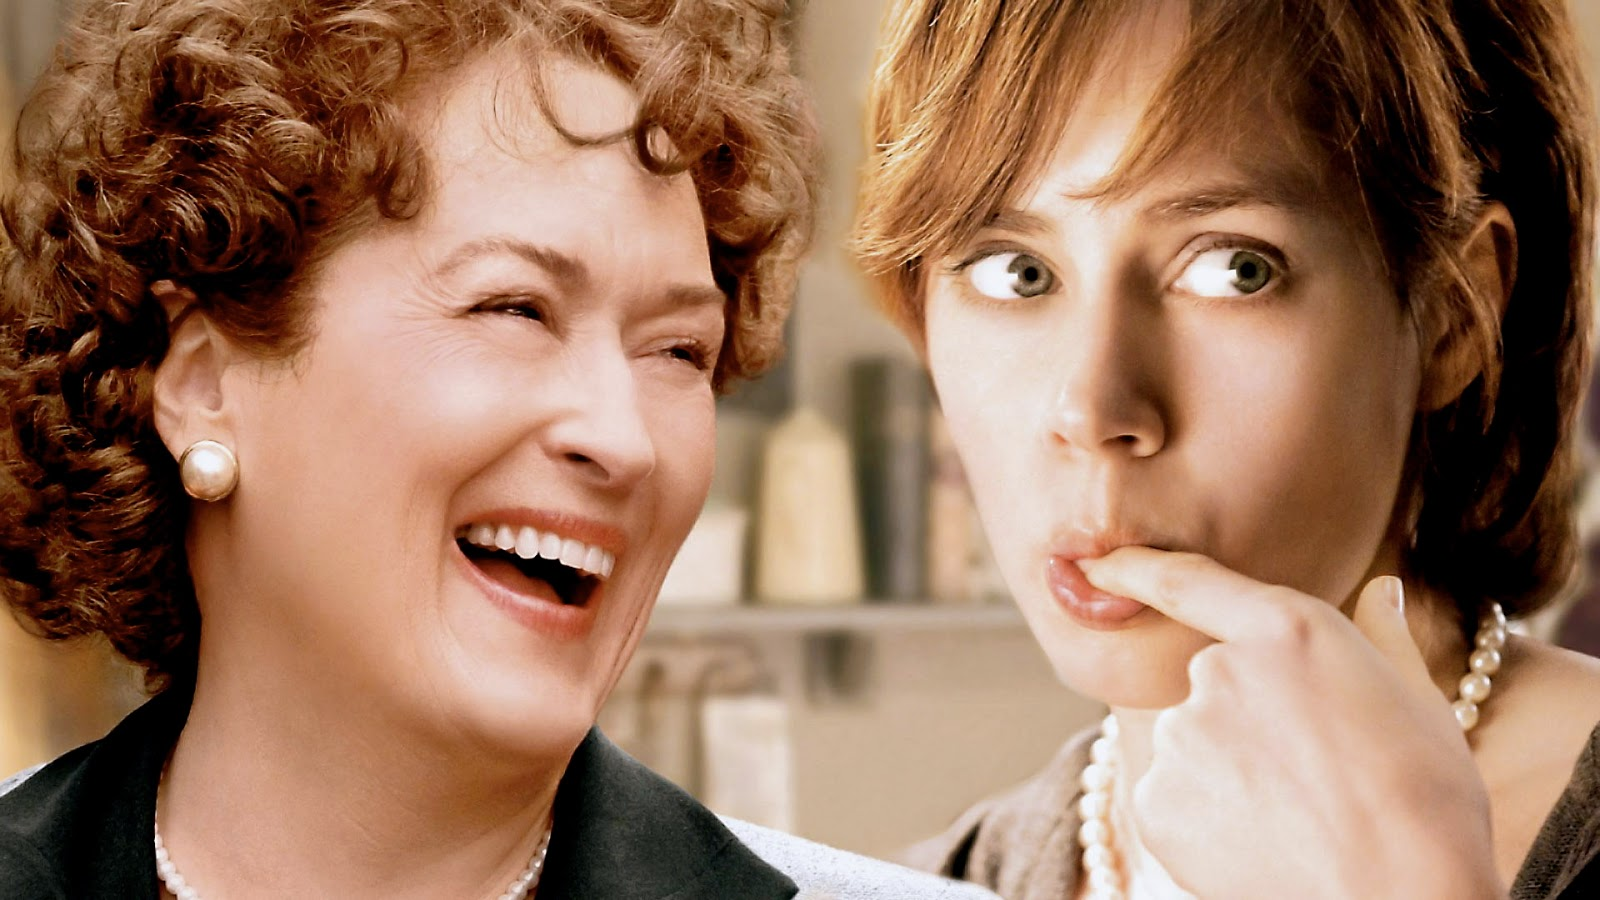 Julie-Julia-Meryl-streep-Amy-Adams-google.-com